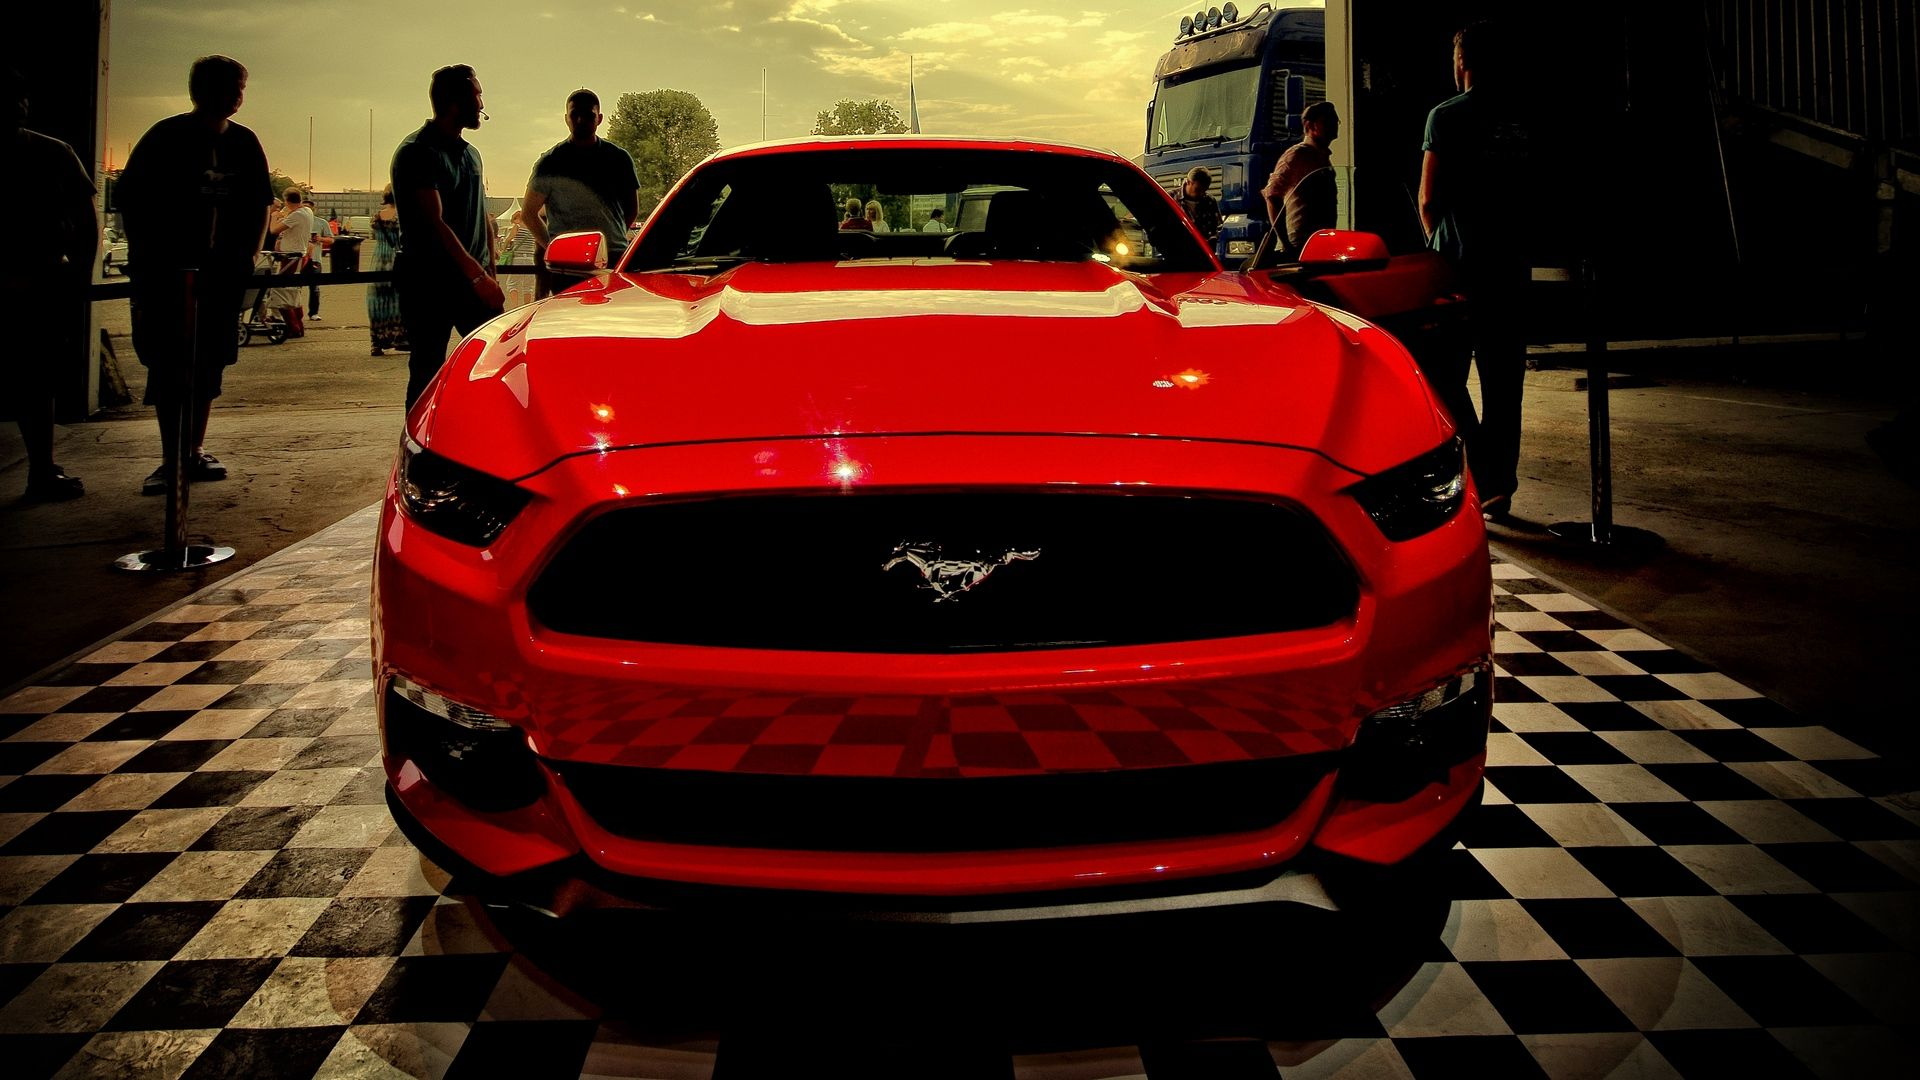 Red Ford Mustang 4k Wallpaper Ford Mustang Mustang Mustang Price